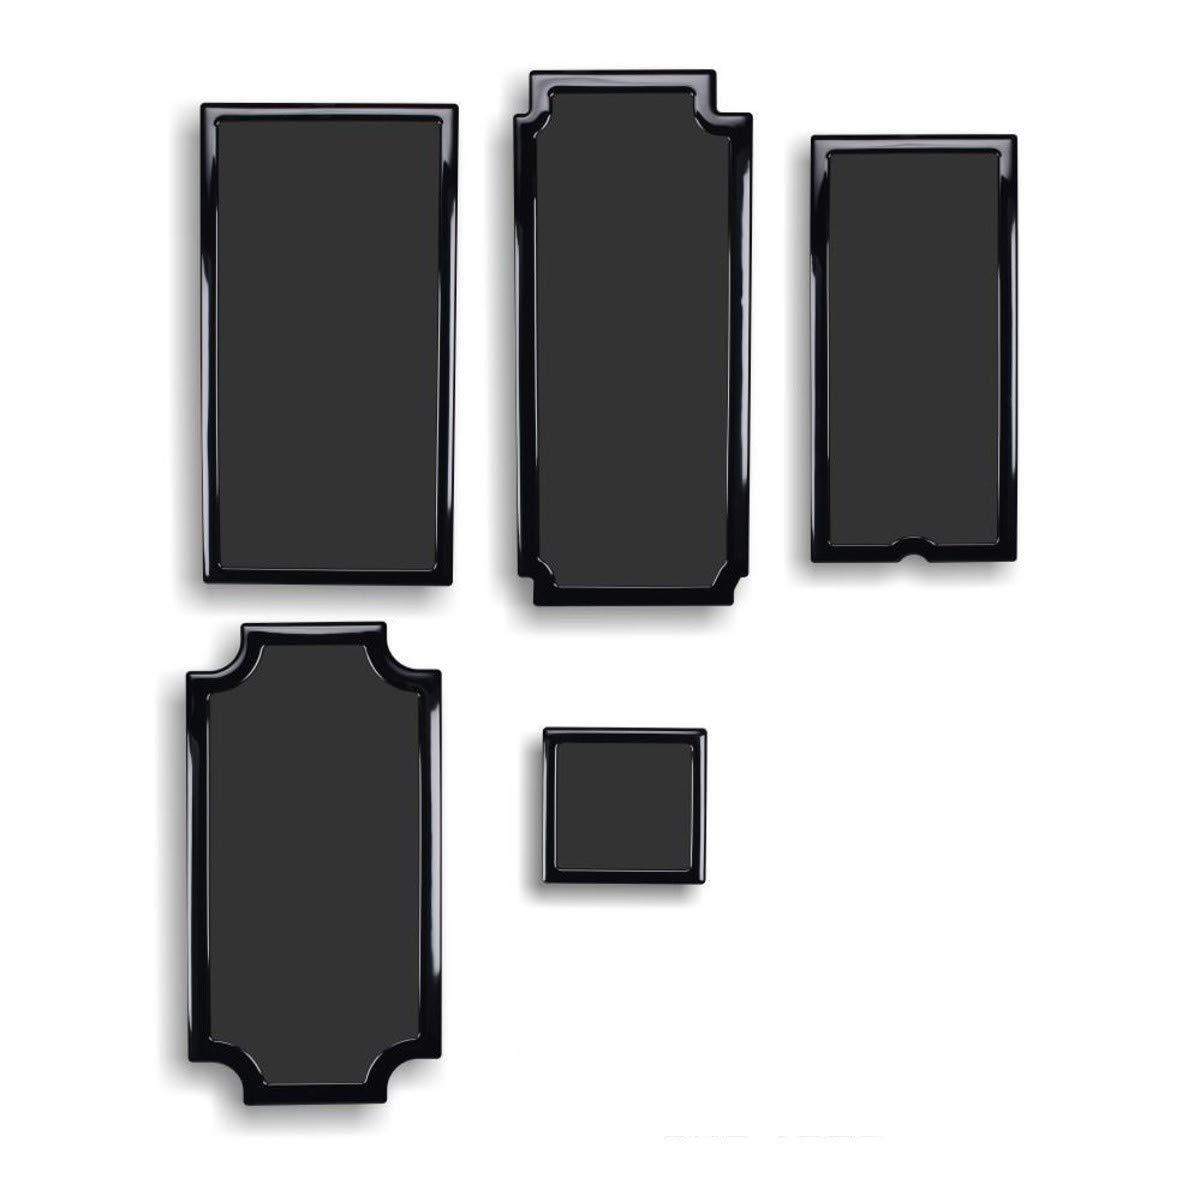 DEMCiflex Dust Filter Kit for Sliger Cerberus X Filter Kit (Case Without Handle) by DEMCiflex